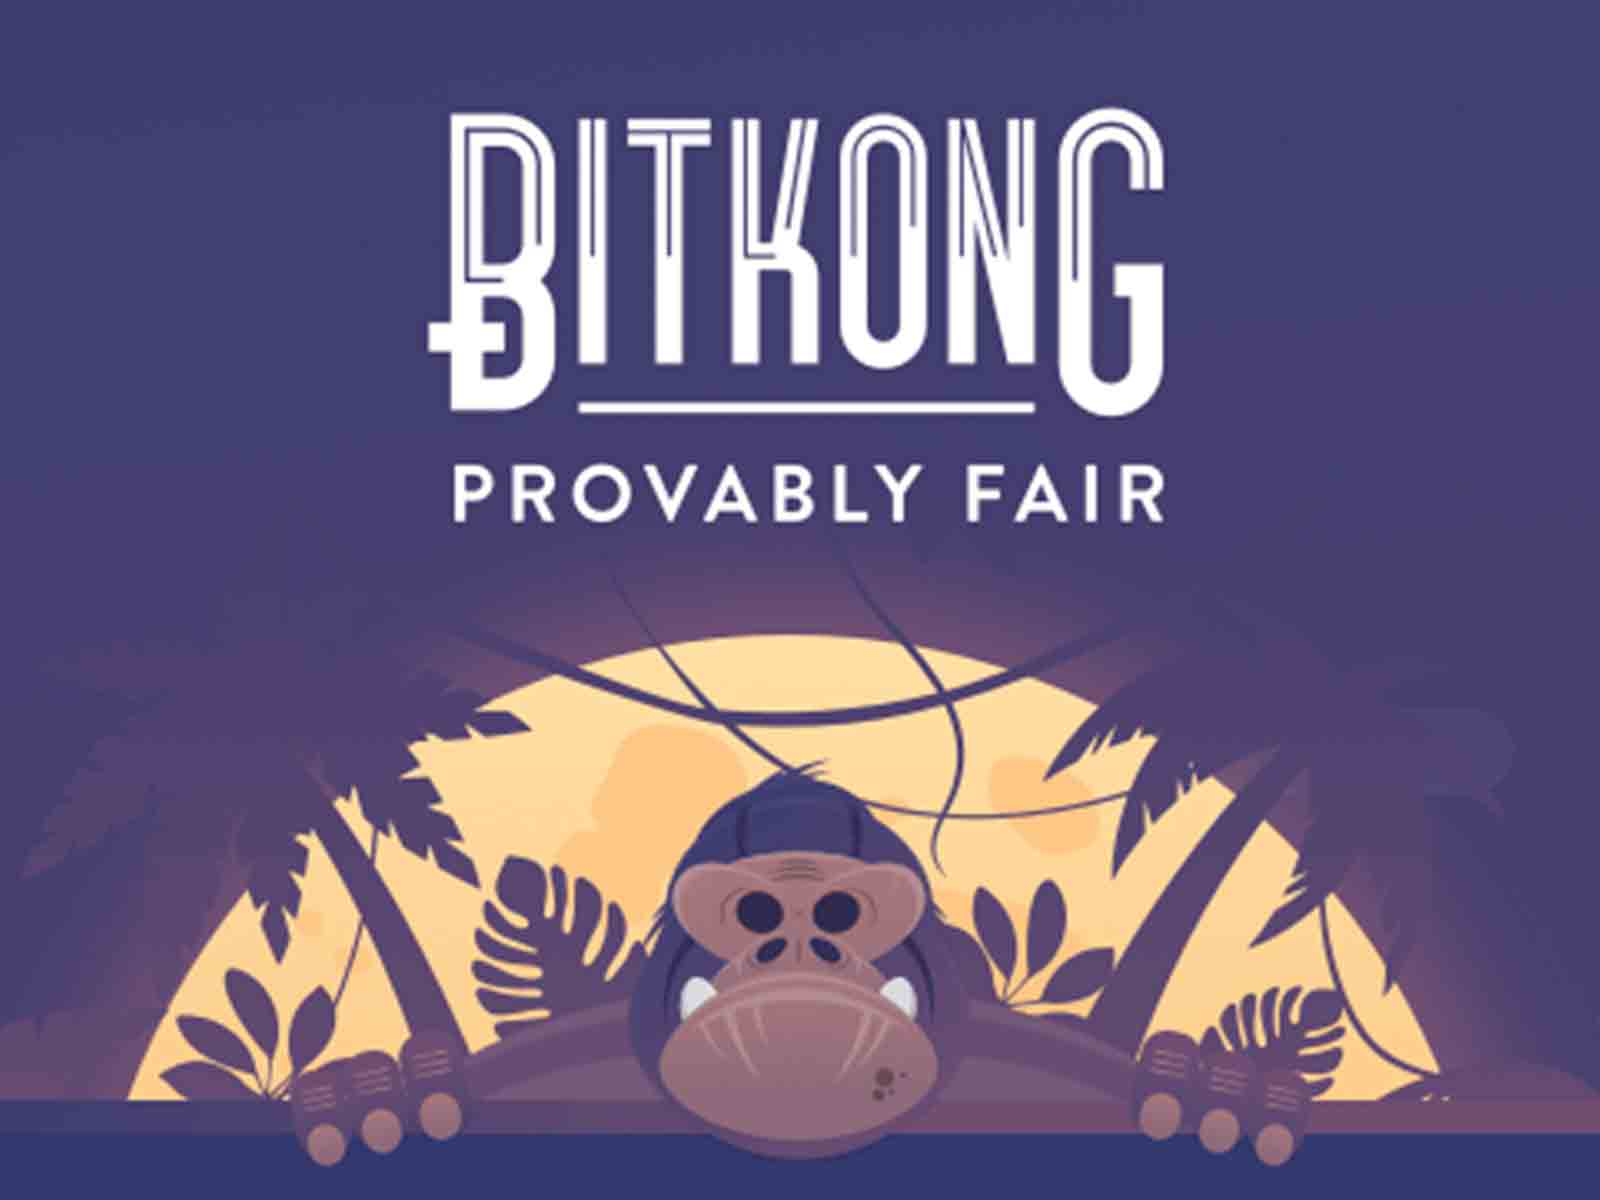 bitkong